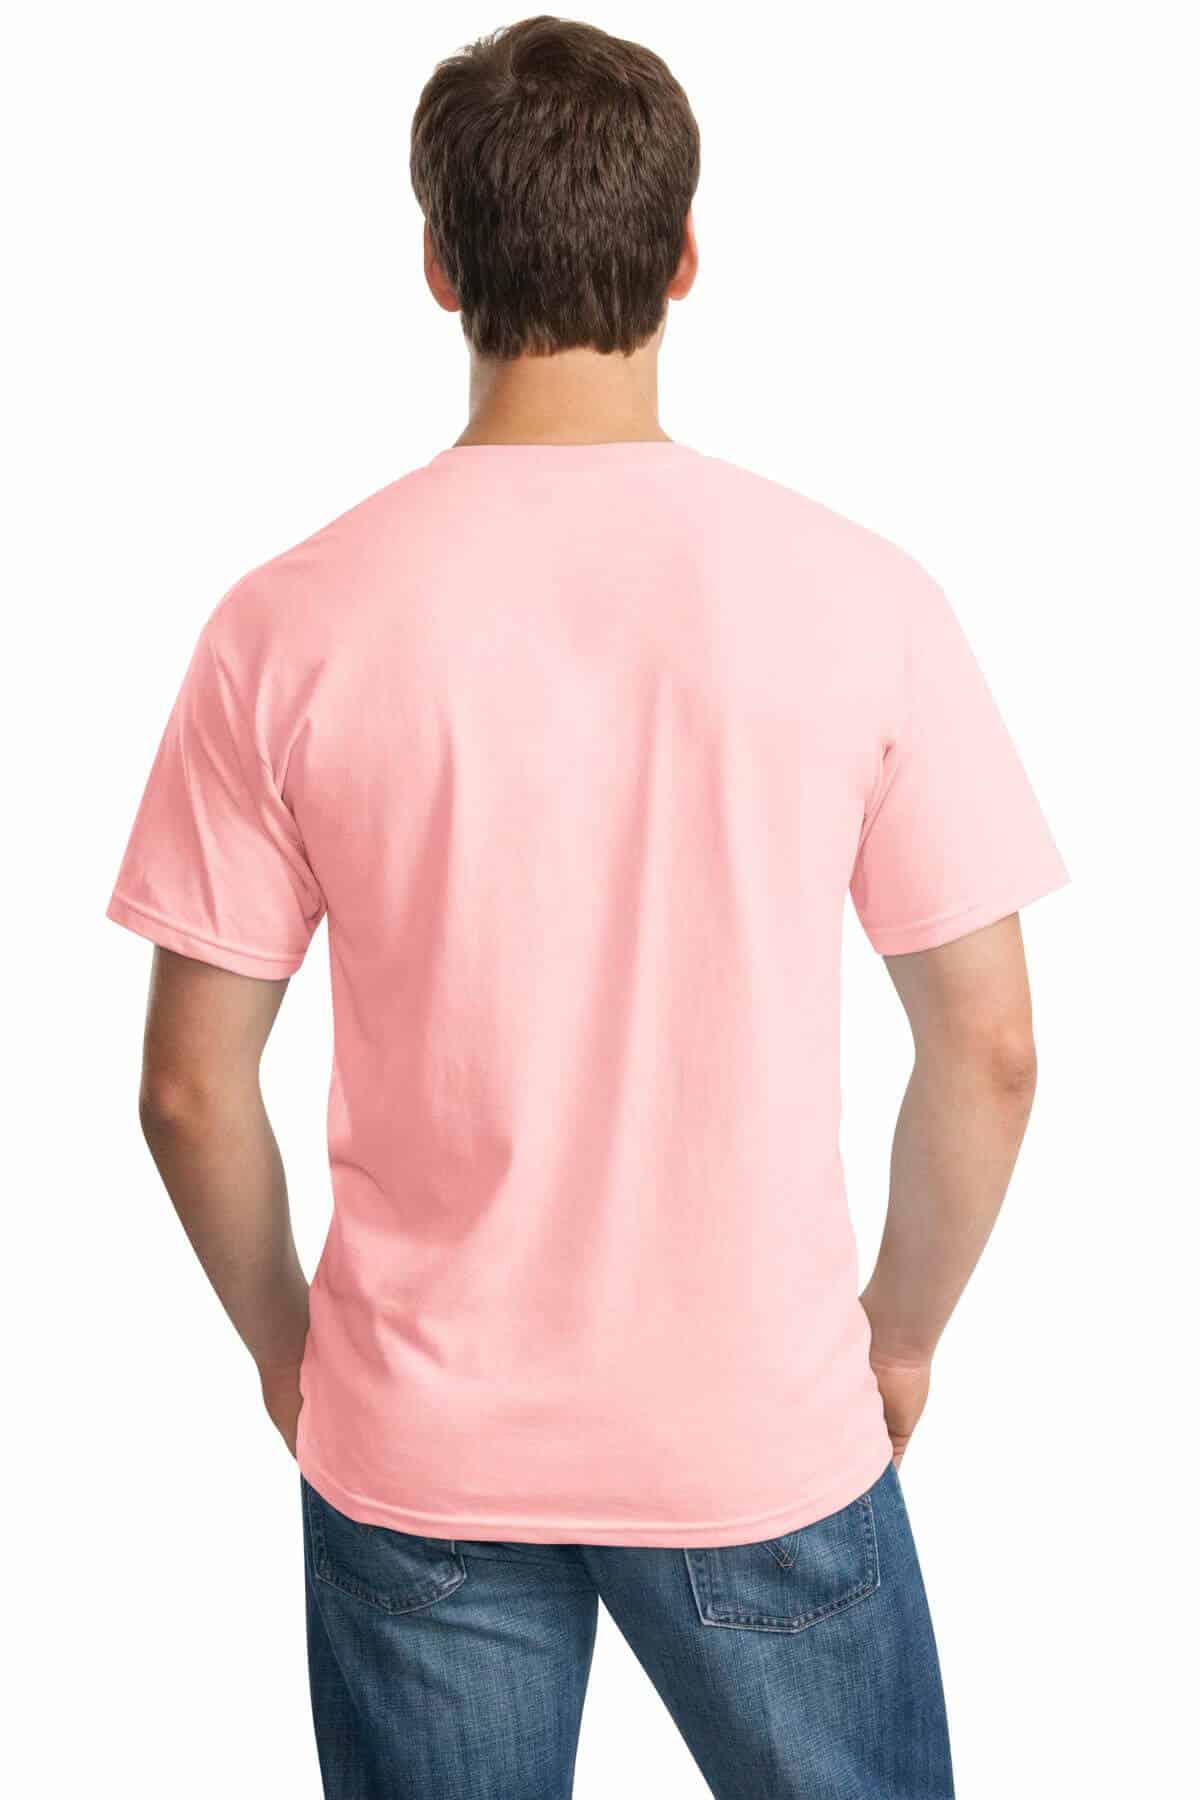 Light Pink Tee Back